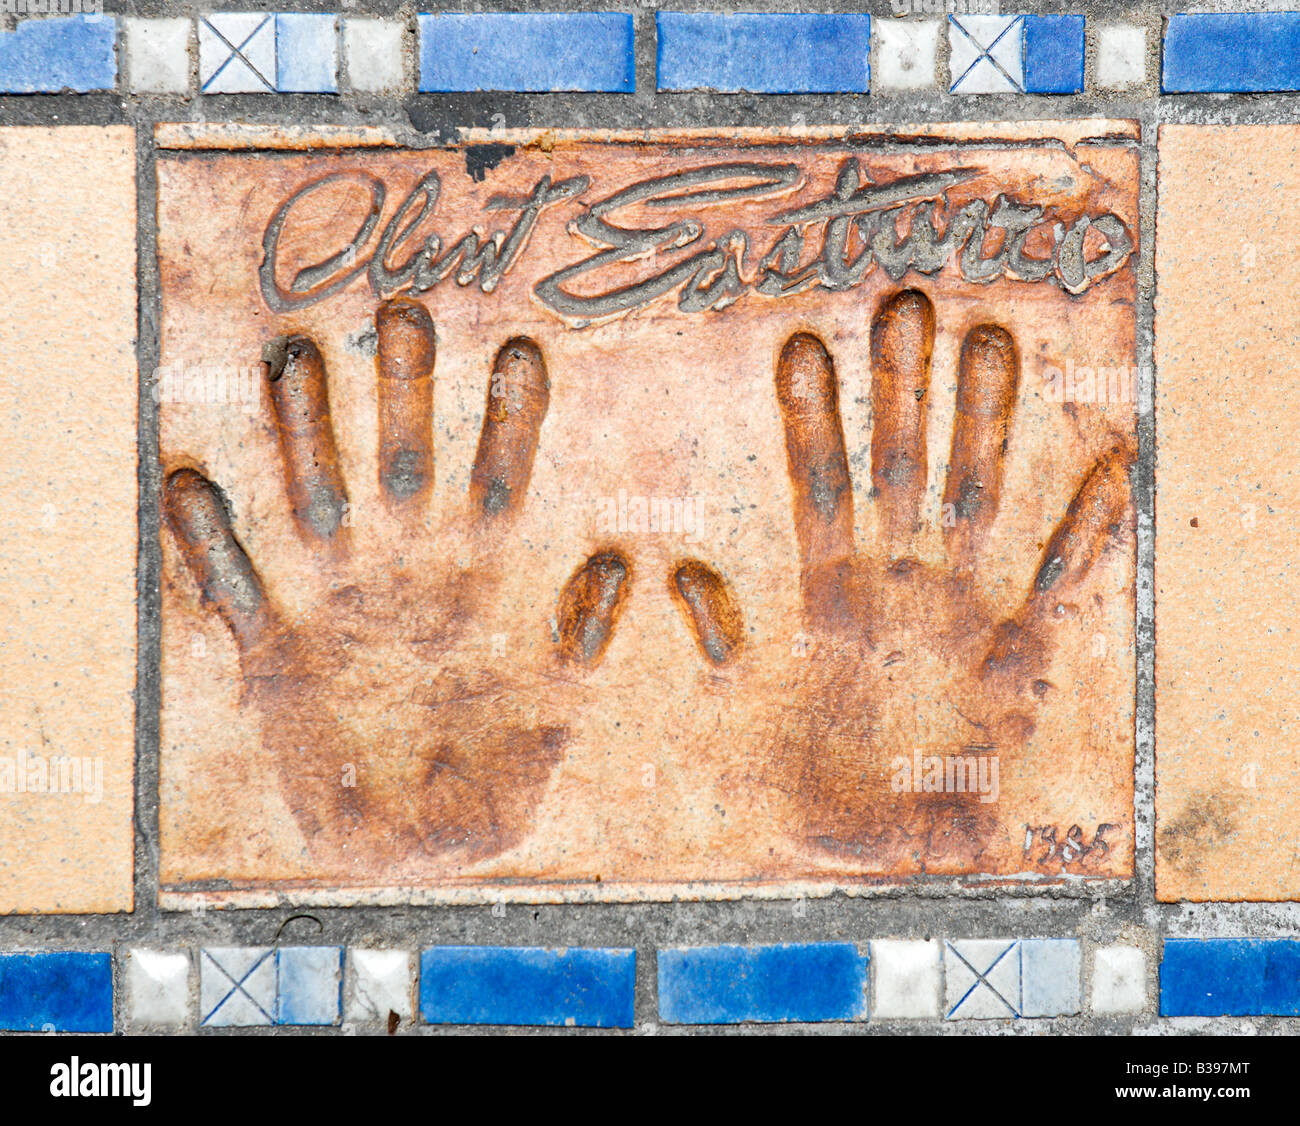 Clint Eastwood handprint on the sidewalk outside the Palais des Festivals, Cannes, Cote d Azur, Provence, France - Stock Image